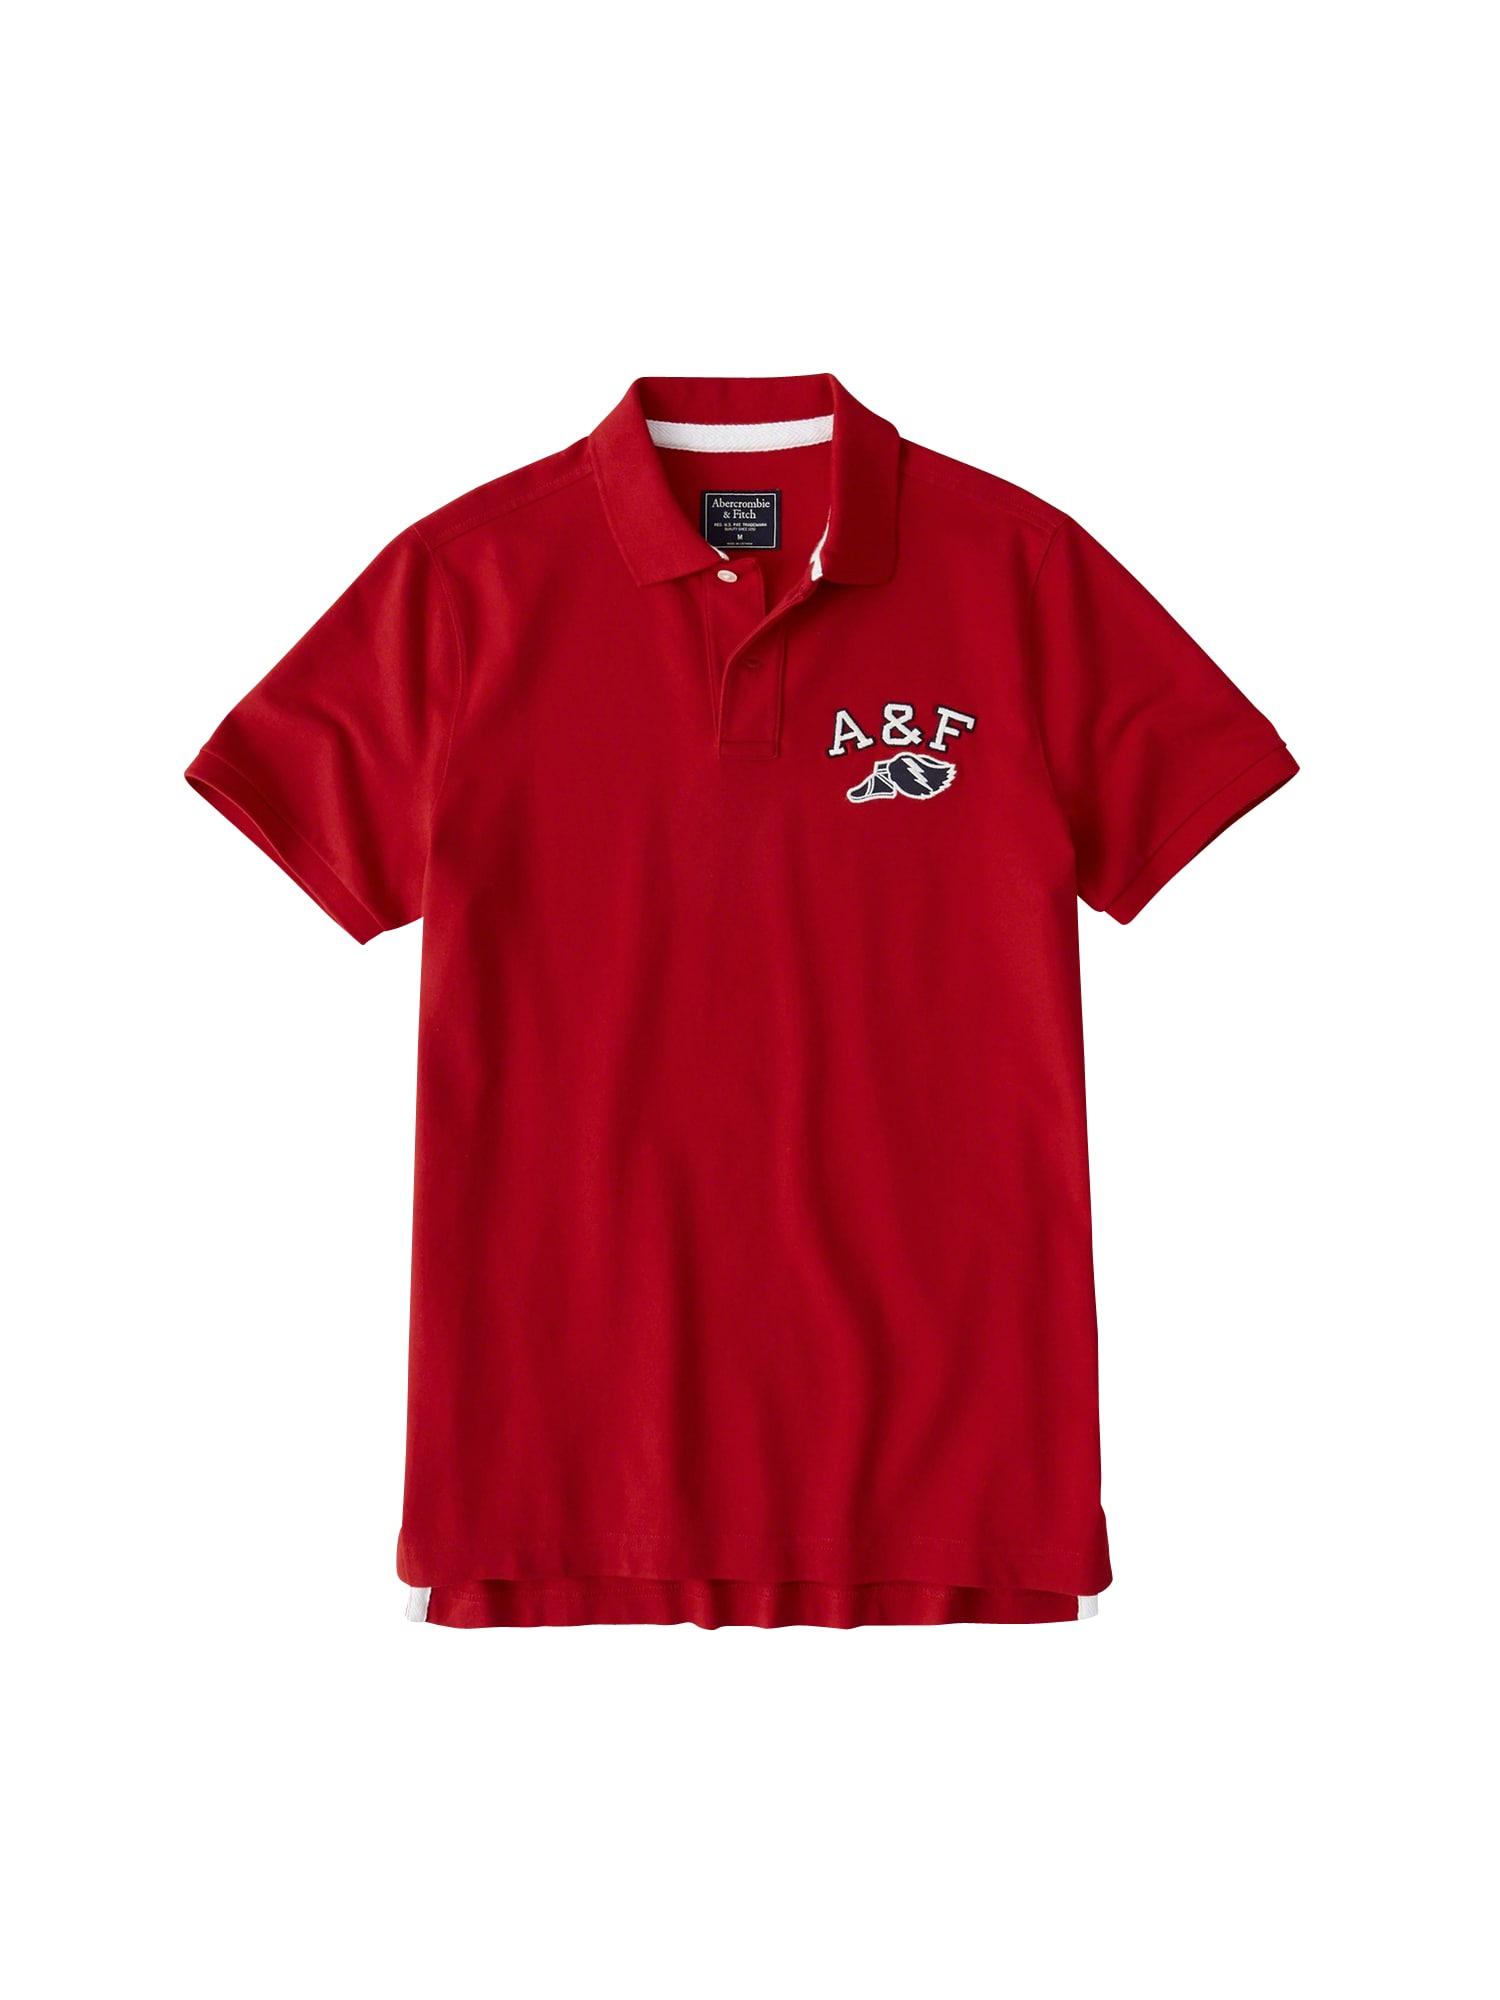 Abercrombie & Fitch Marškinėliai 'MRKTD POLO' raudona